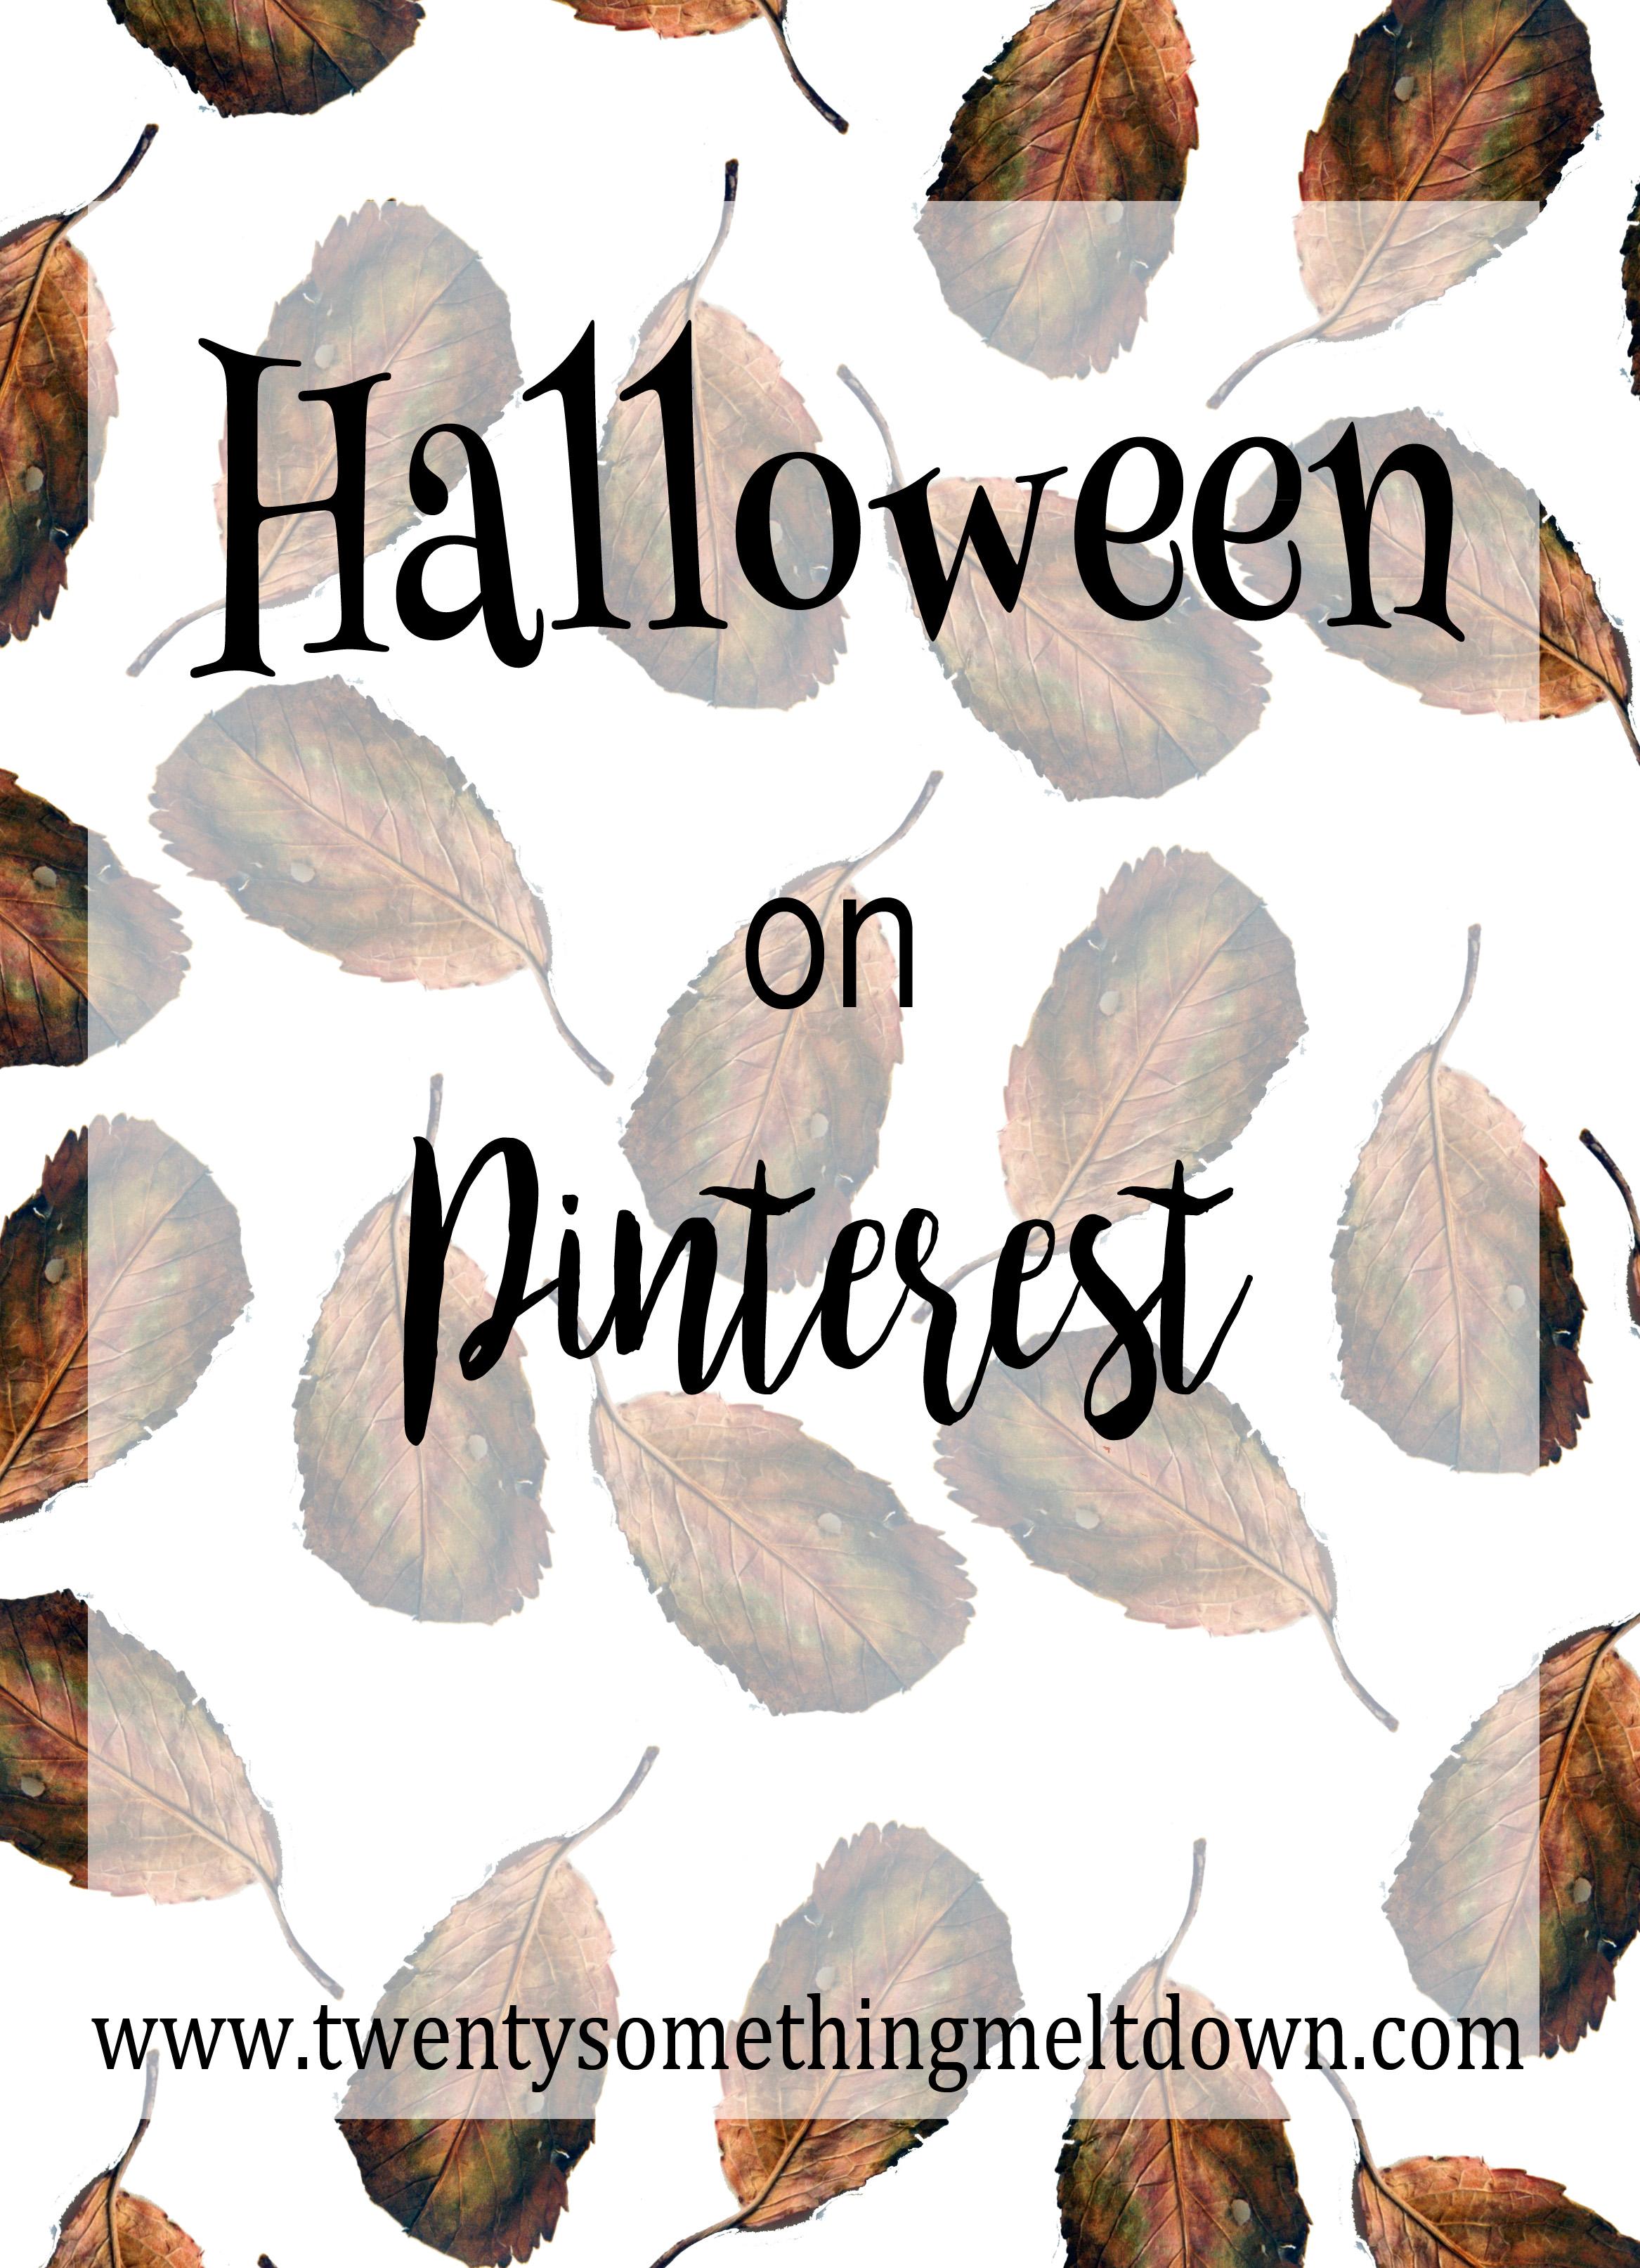 Follow me on Pinterest here!